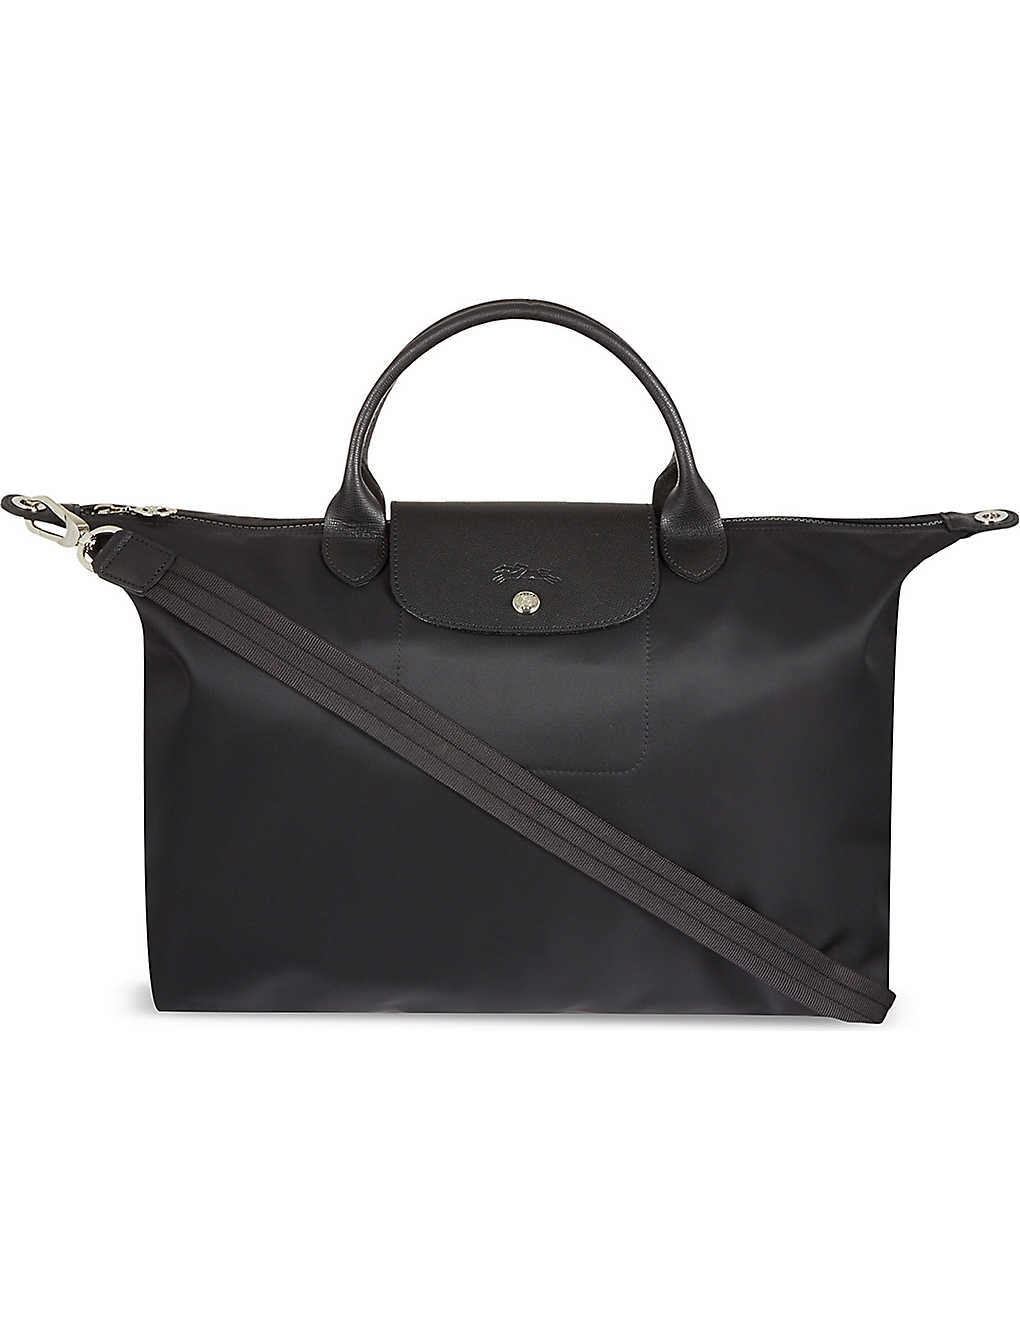 c0087607019 LONGCHAMP - Le Pliage Neo large handbag   Selfridges.com